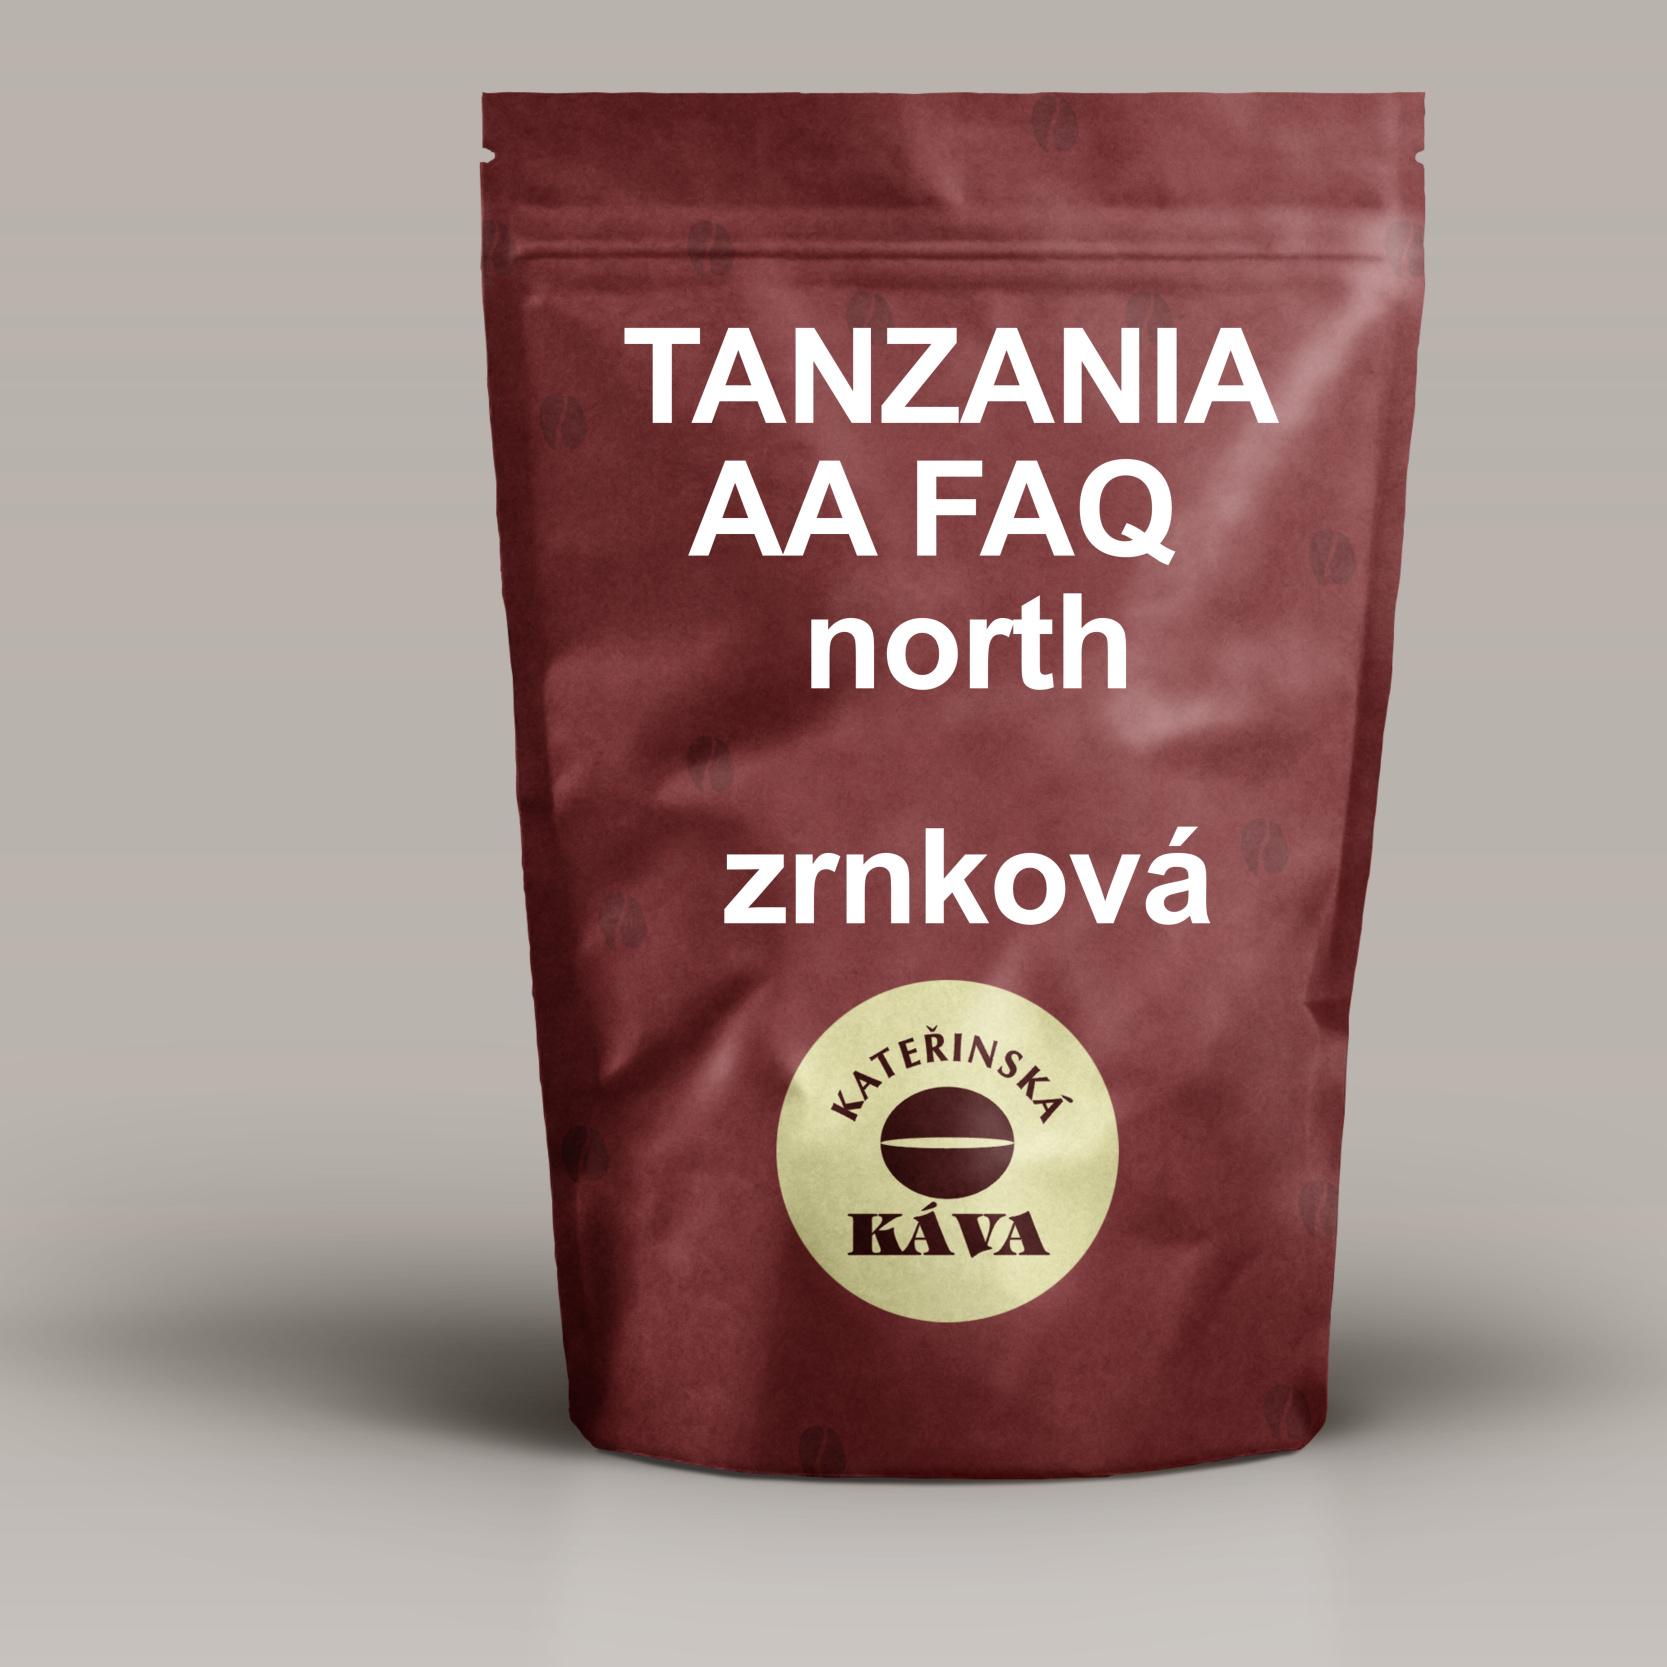 TANZANIA AA FAQ North -zrnková